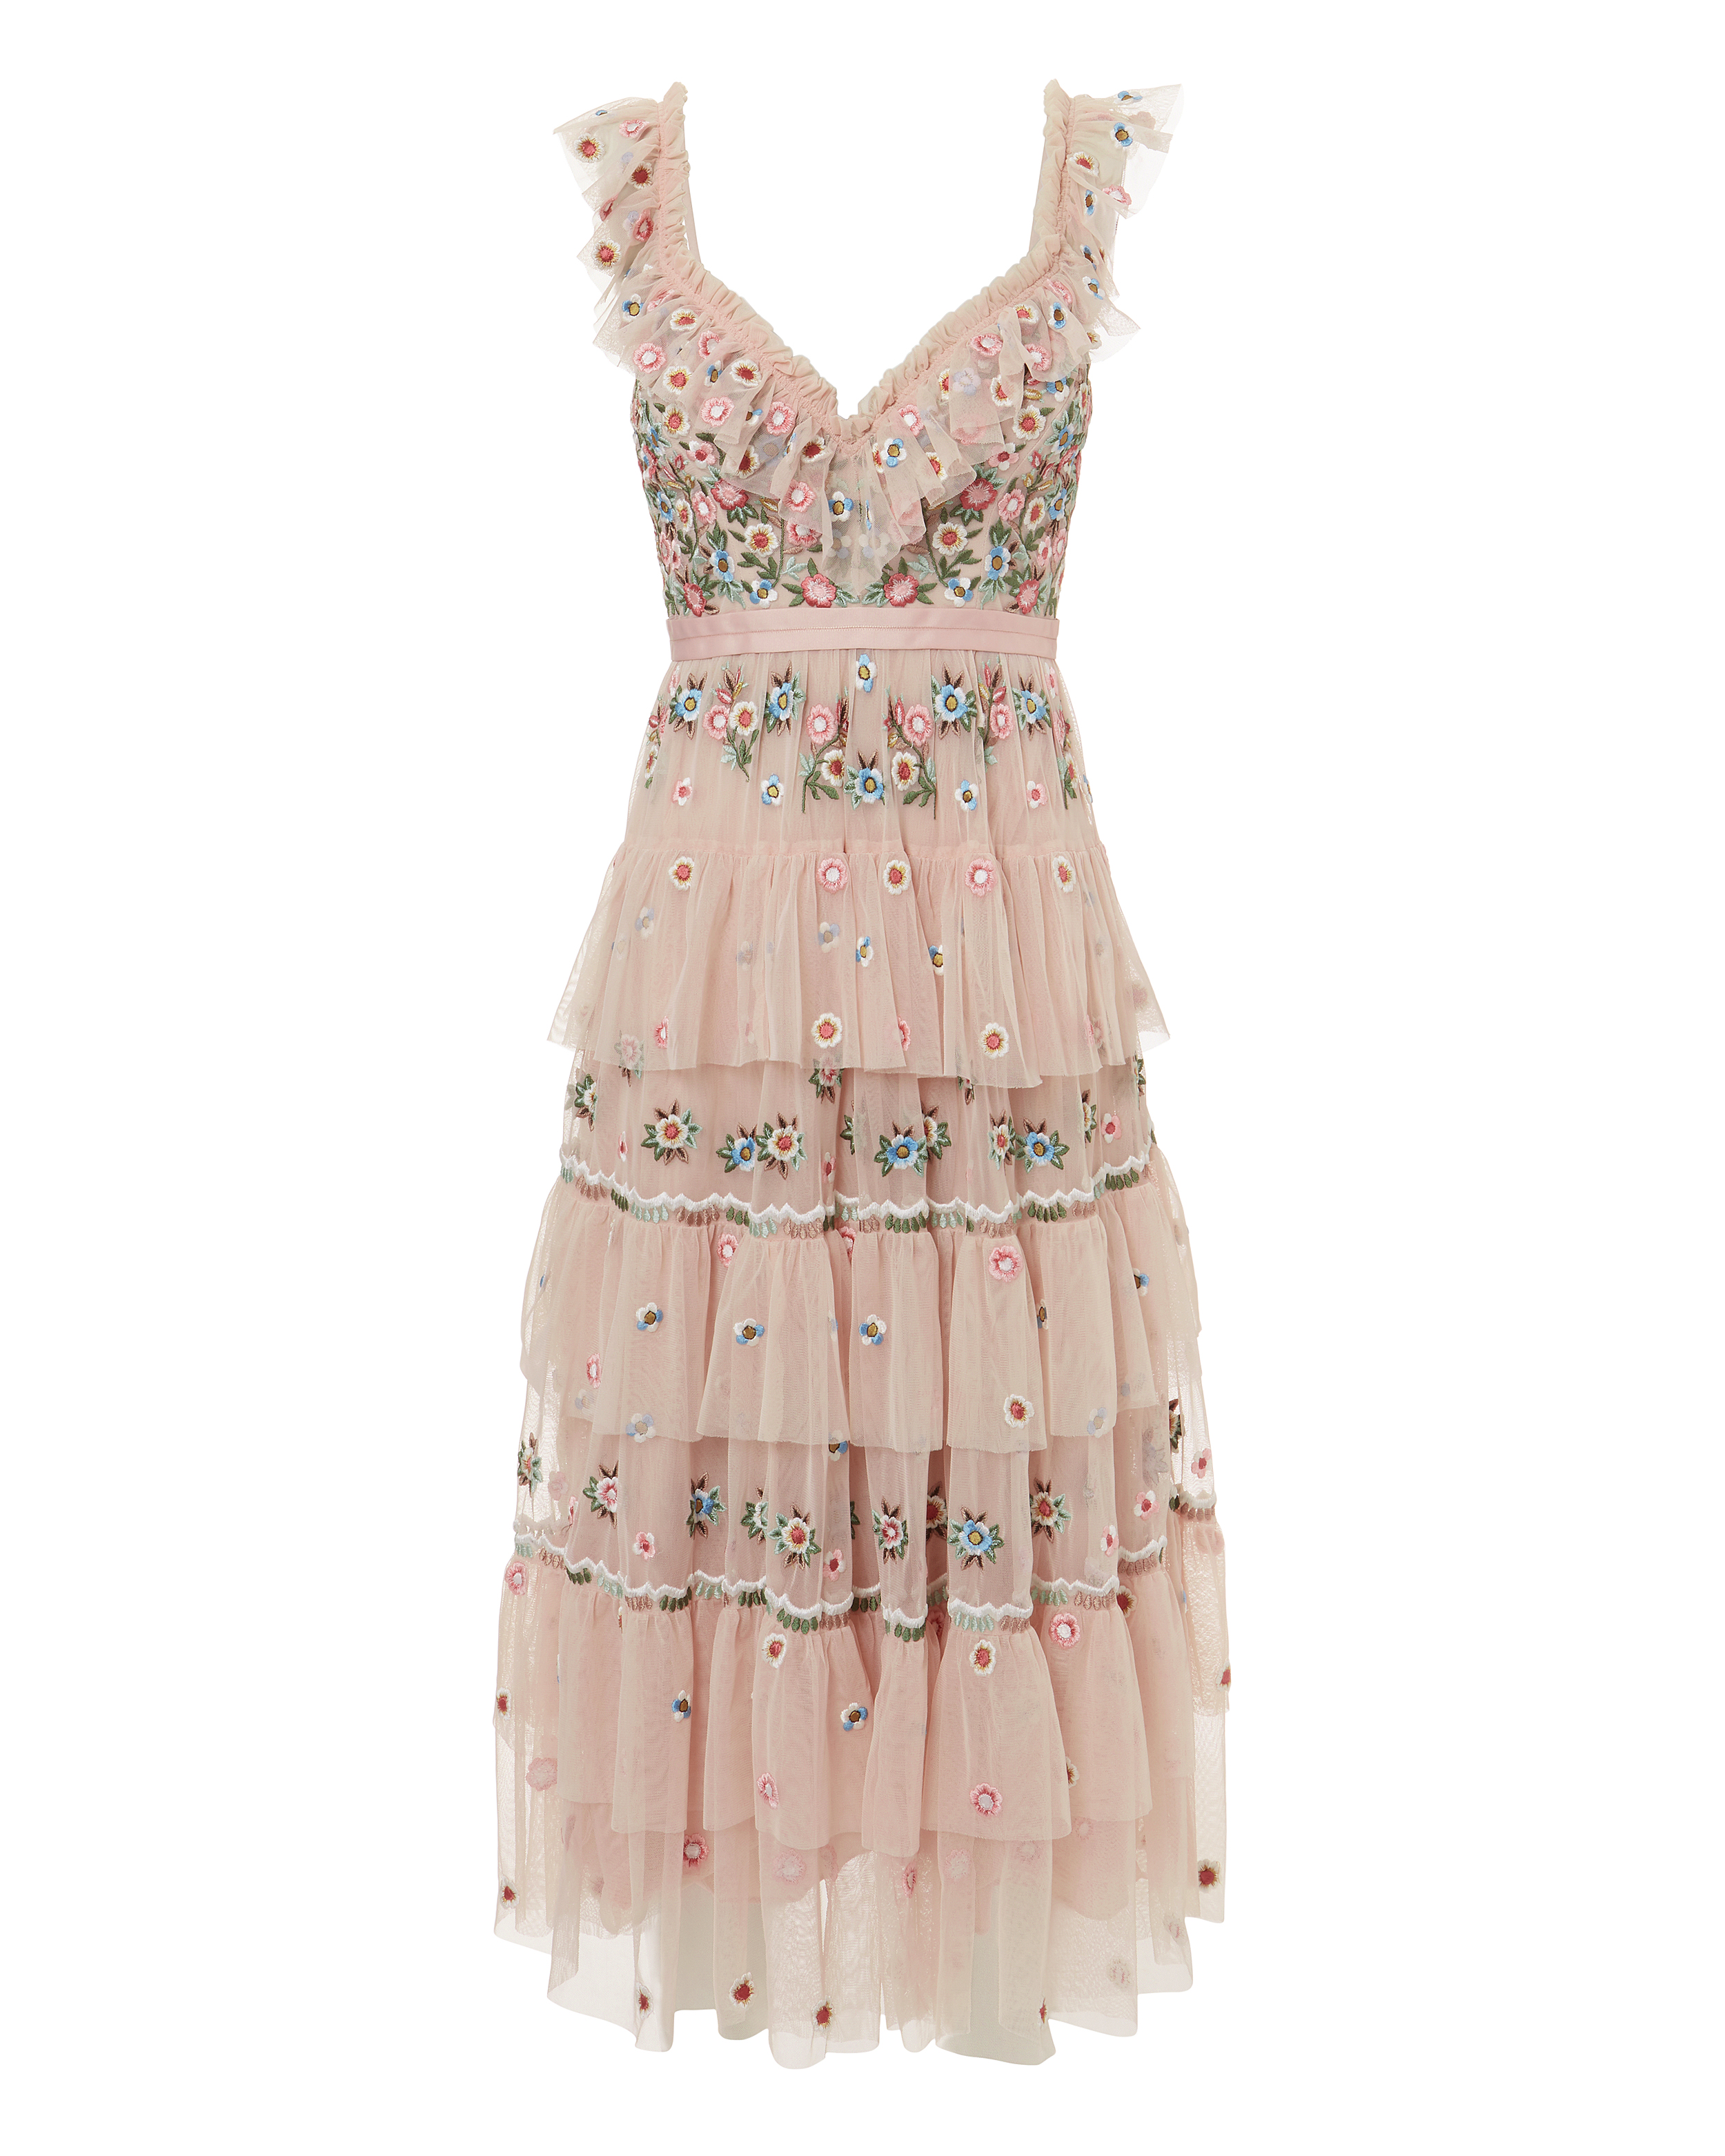 Whimsical Embellished Midi Dress by Needle & Thread